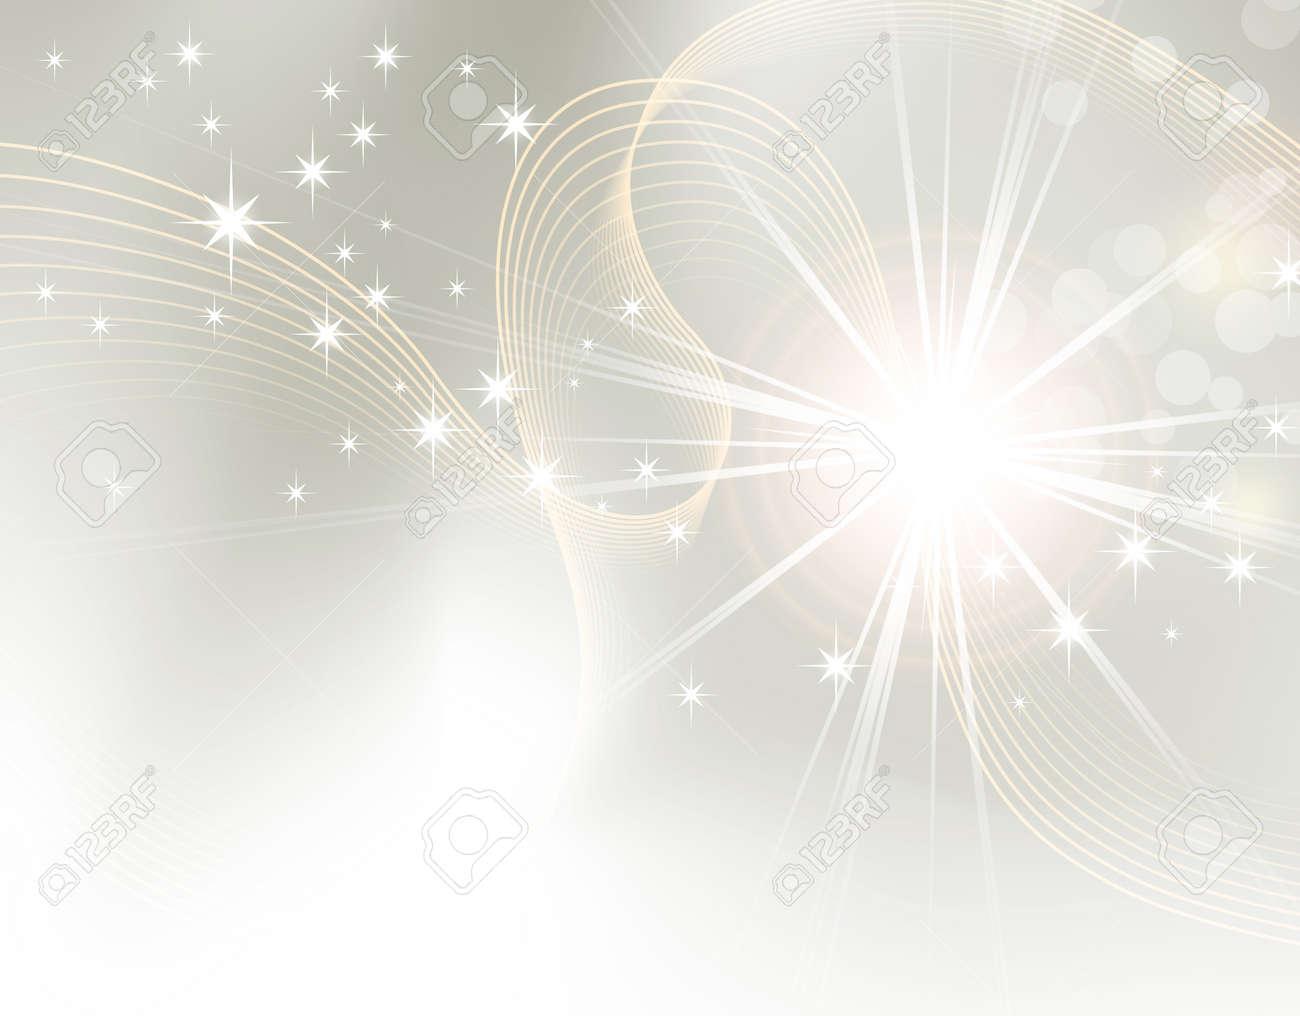 light abstract background design sunburst starburst royalty free